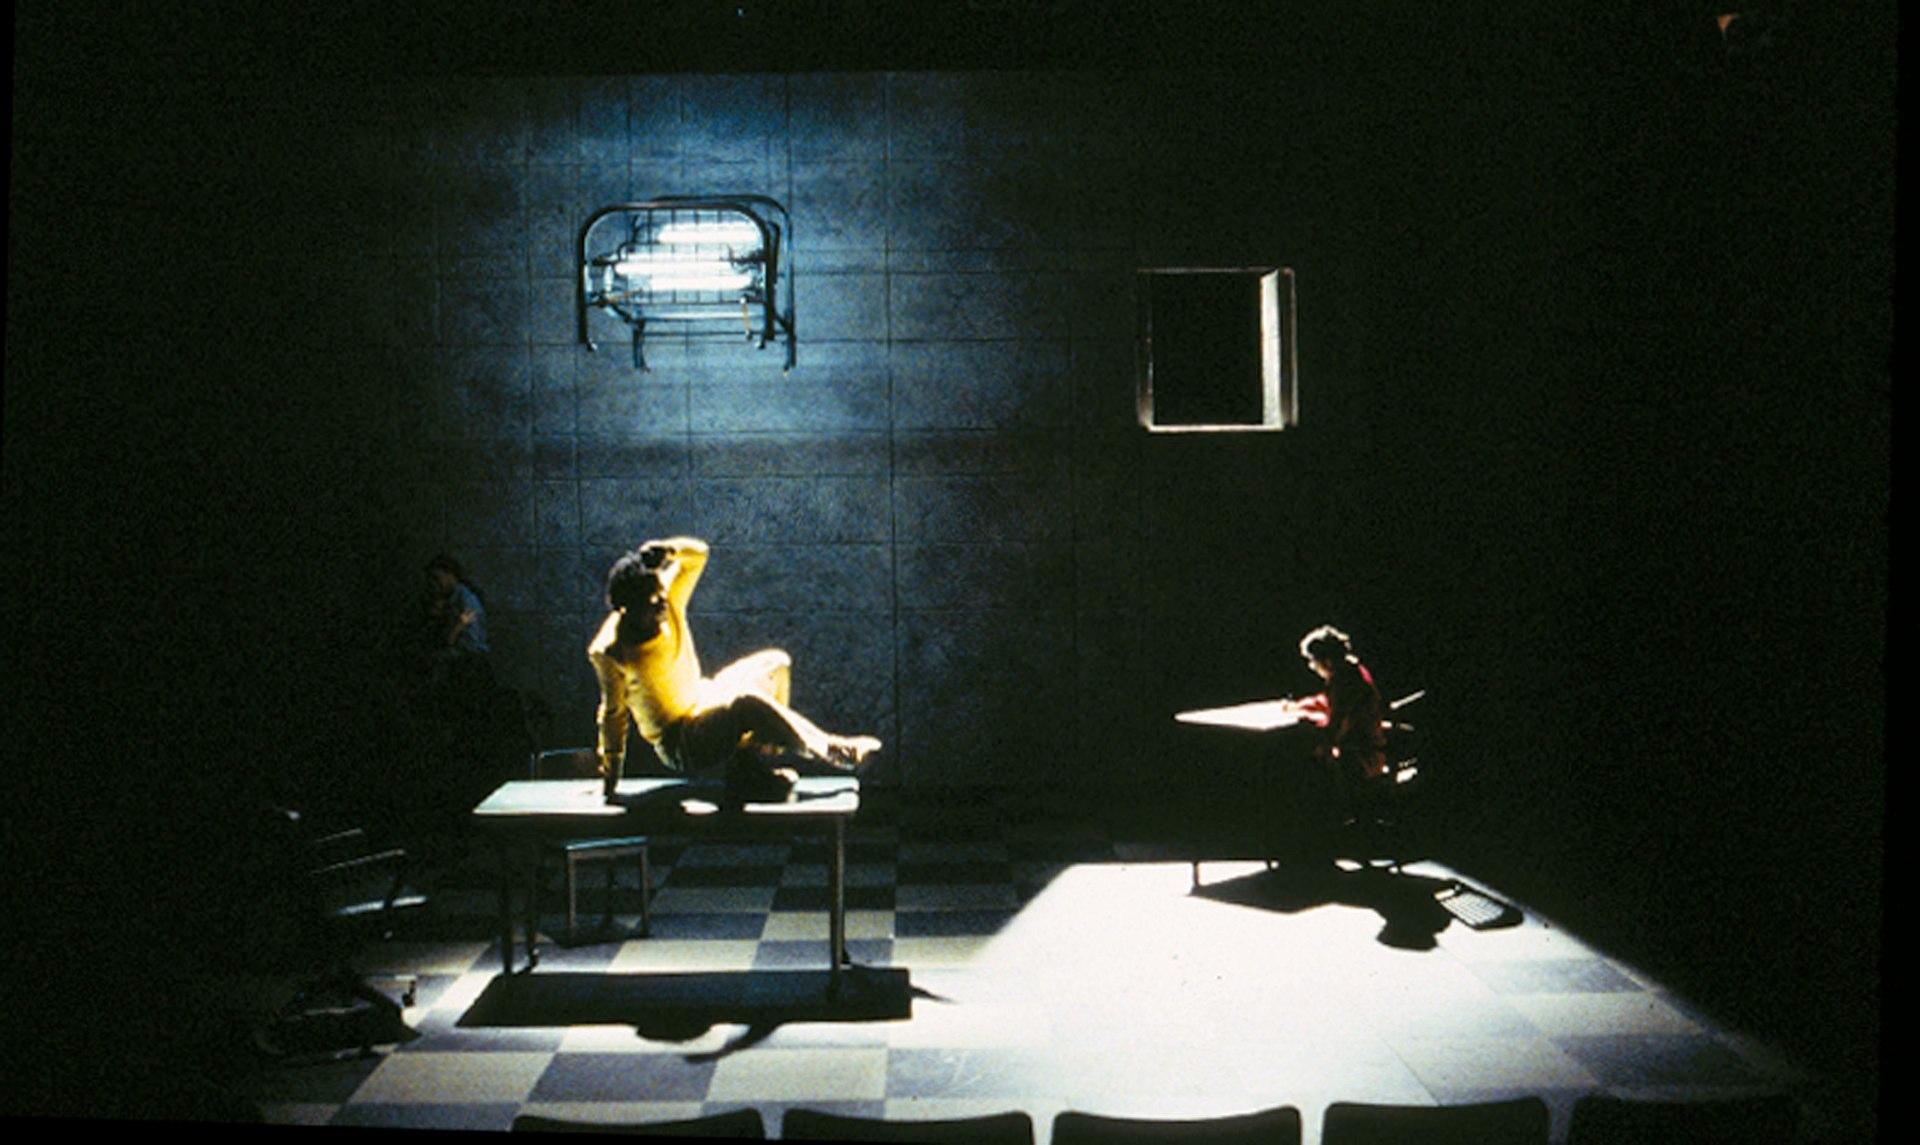 Sleep Deprivation Chamber, UW School of Drama, 2001